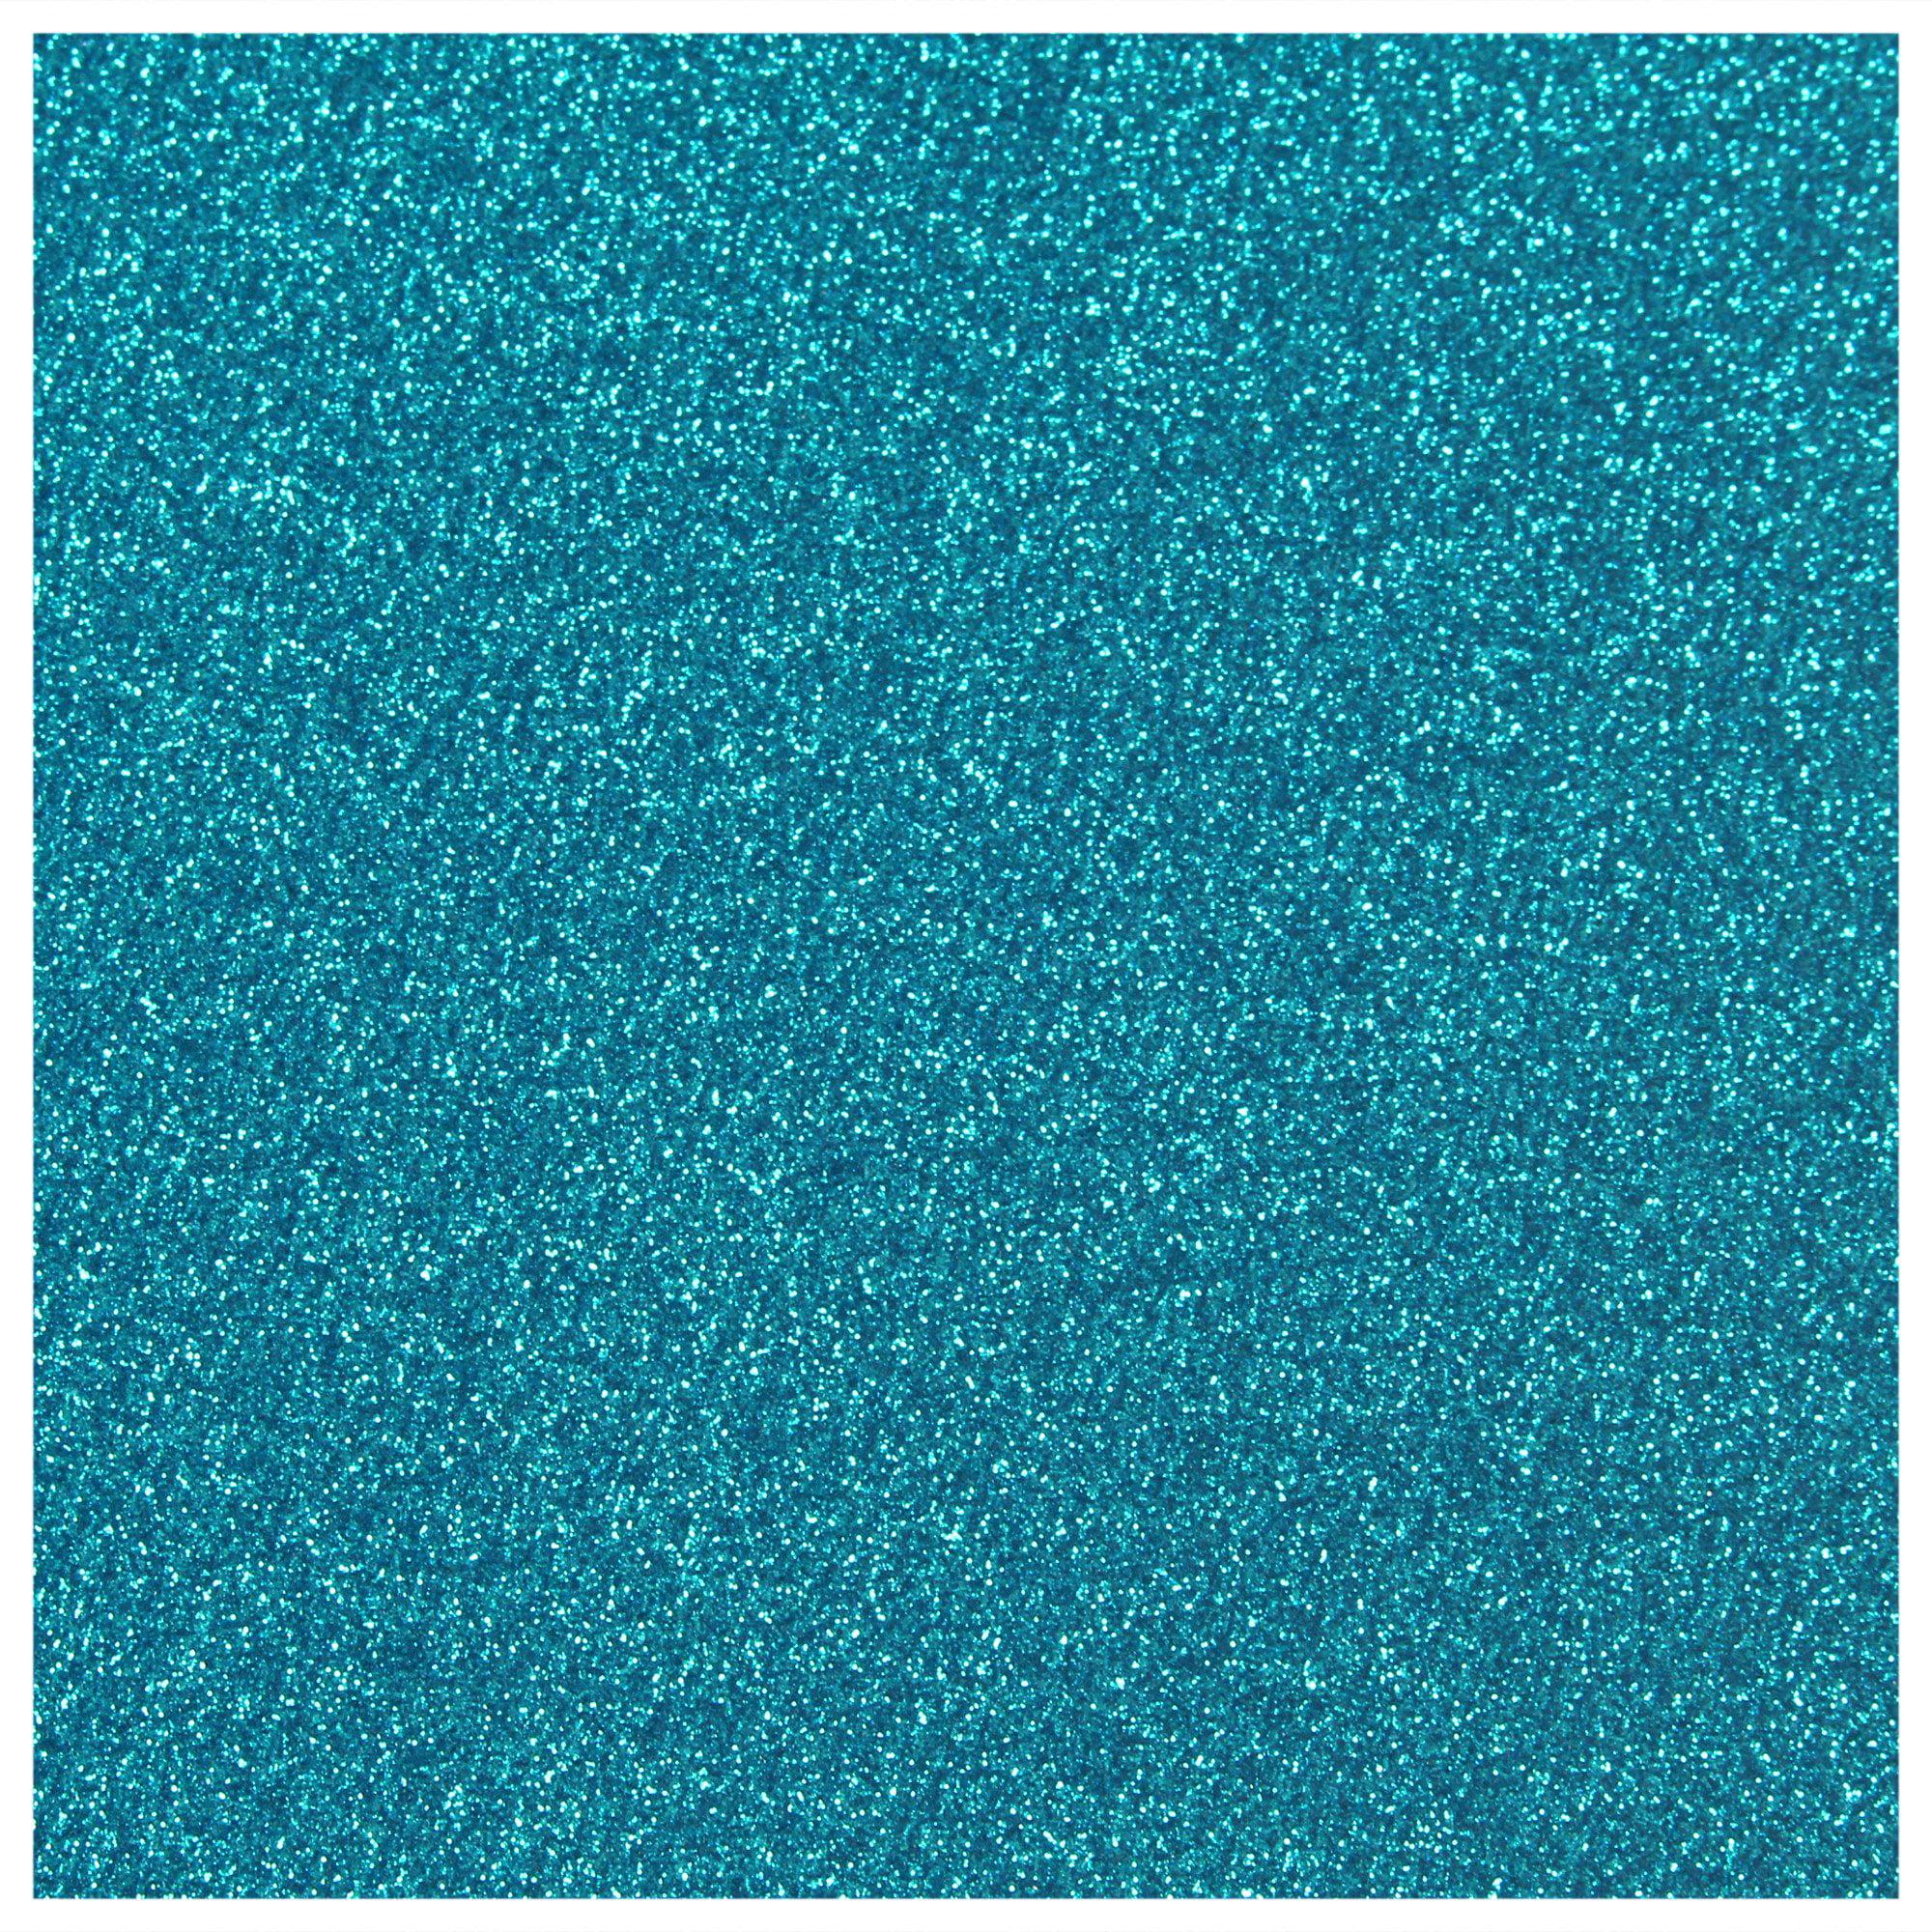 Siser Glitter Heat Transfer Material - Aqua